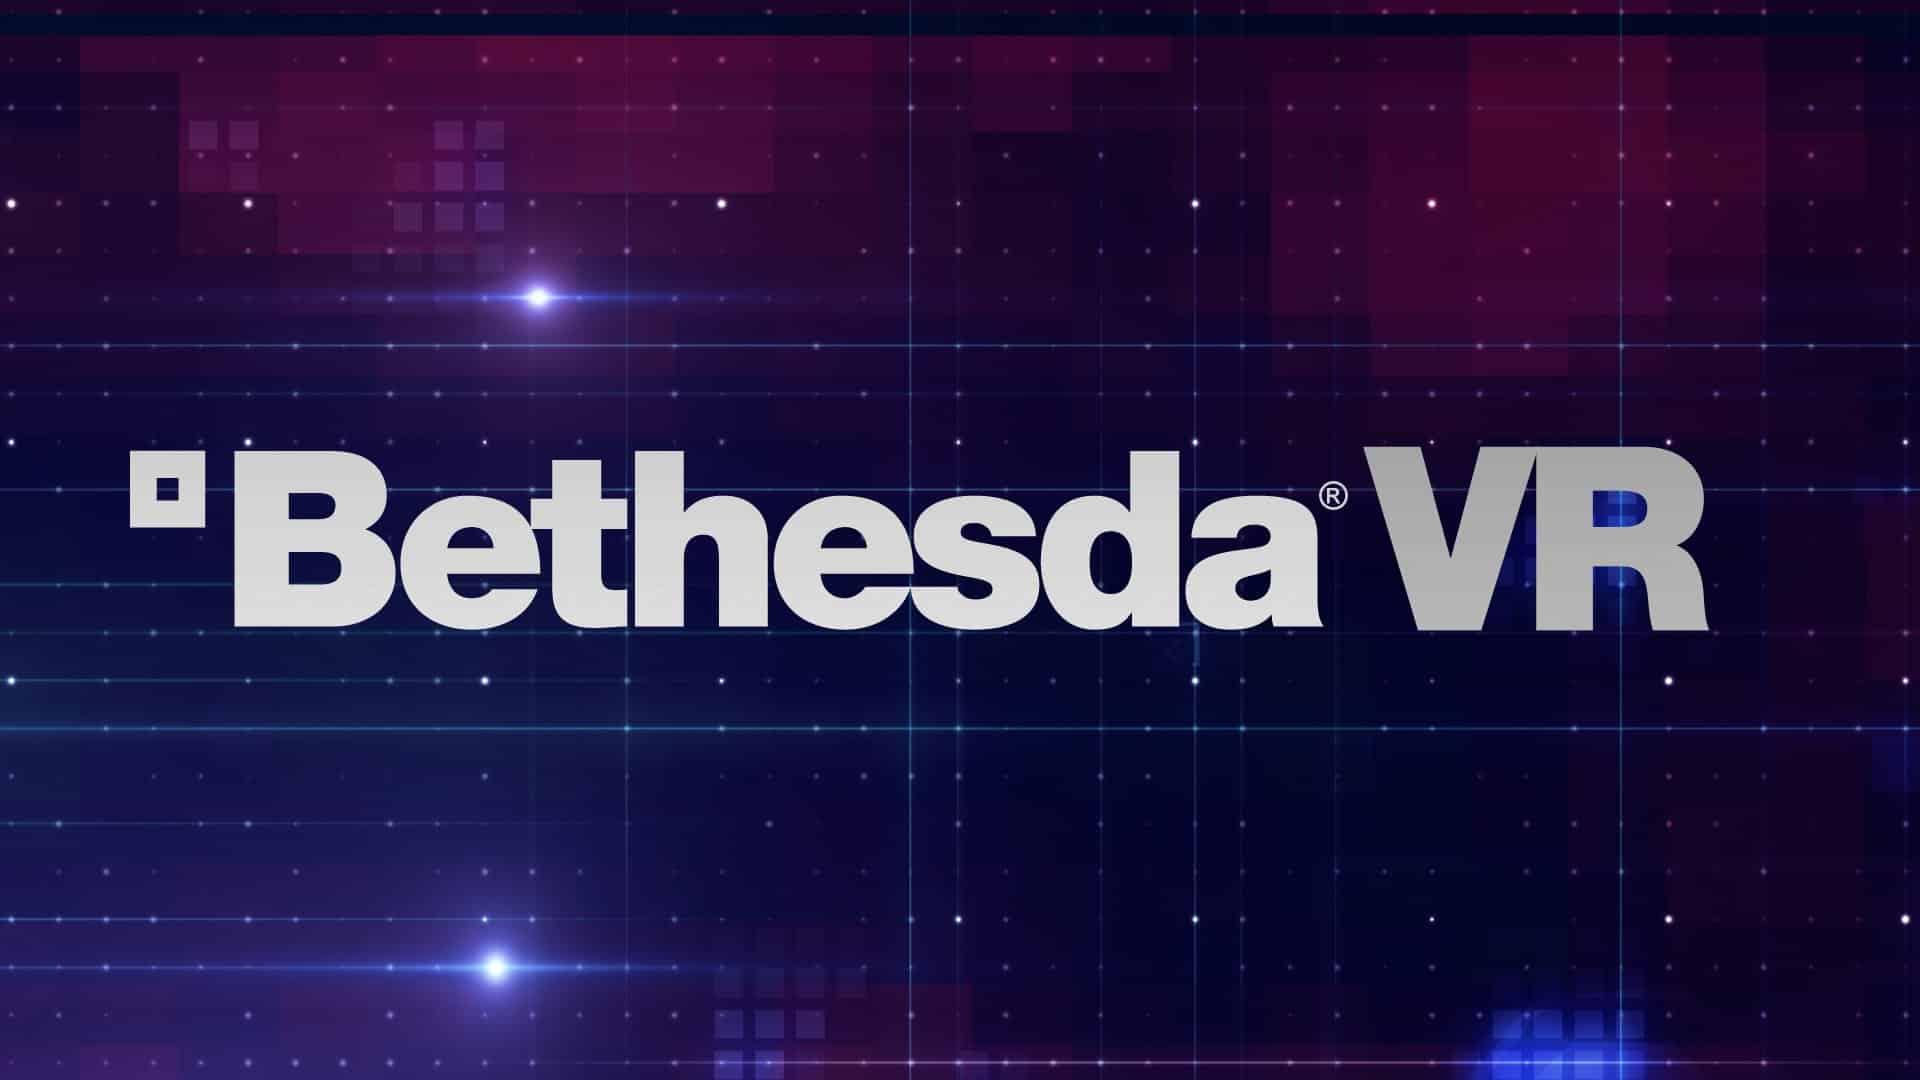 Bethesda VR VR4player.fr